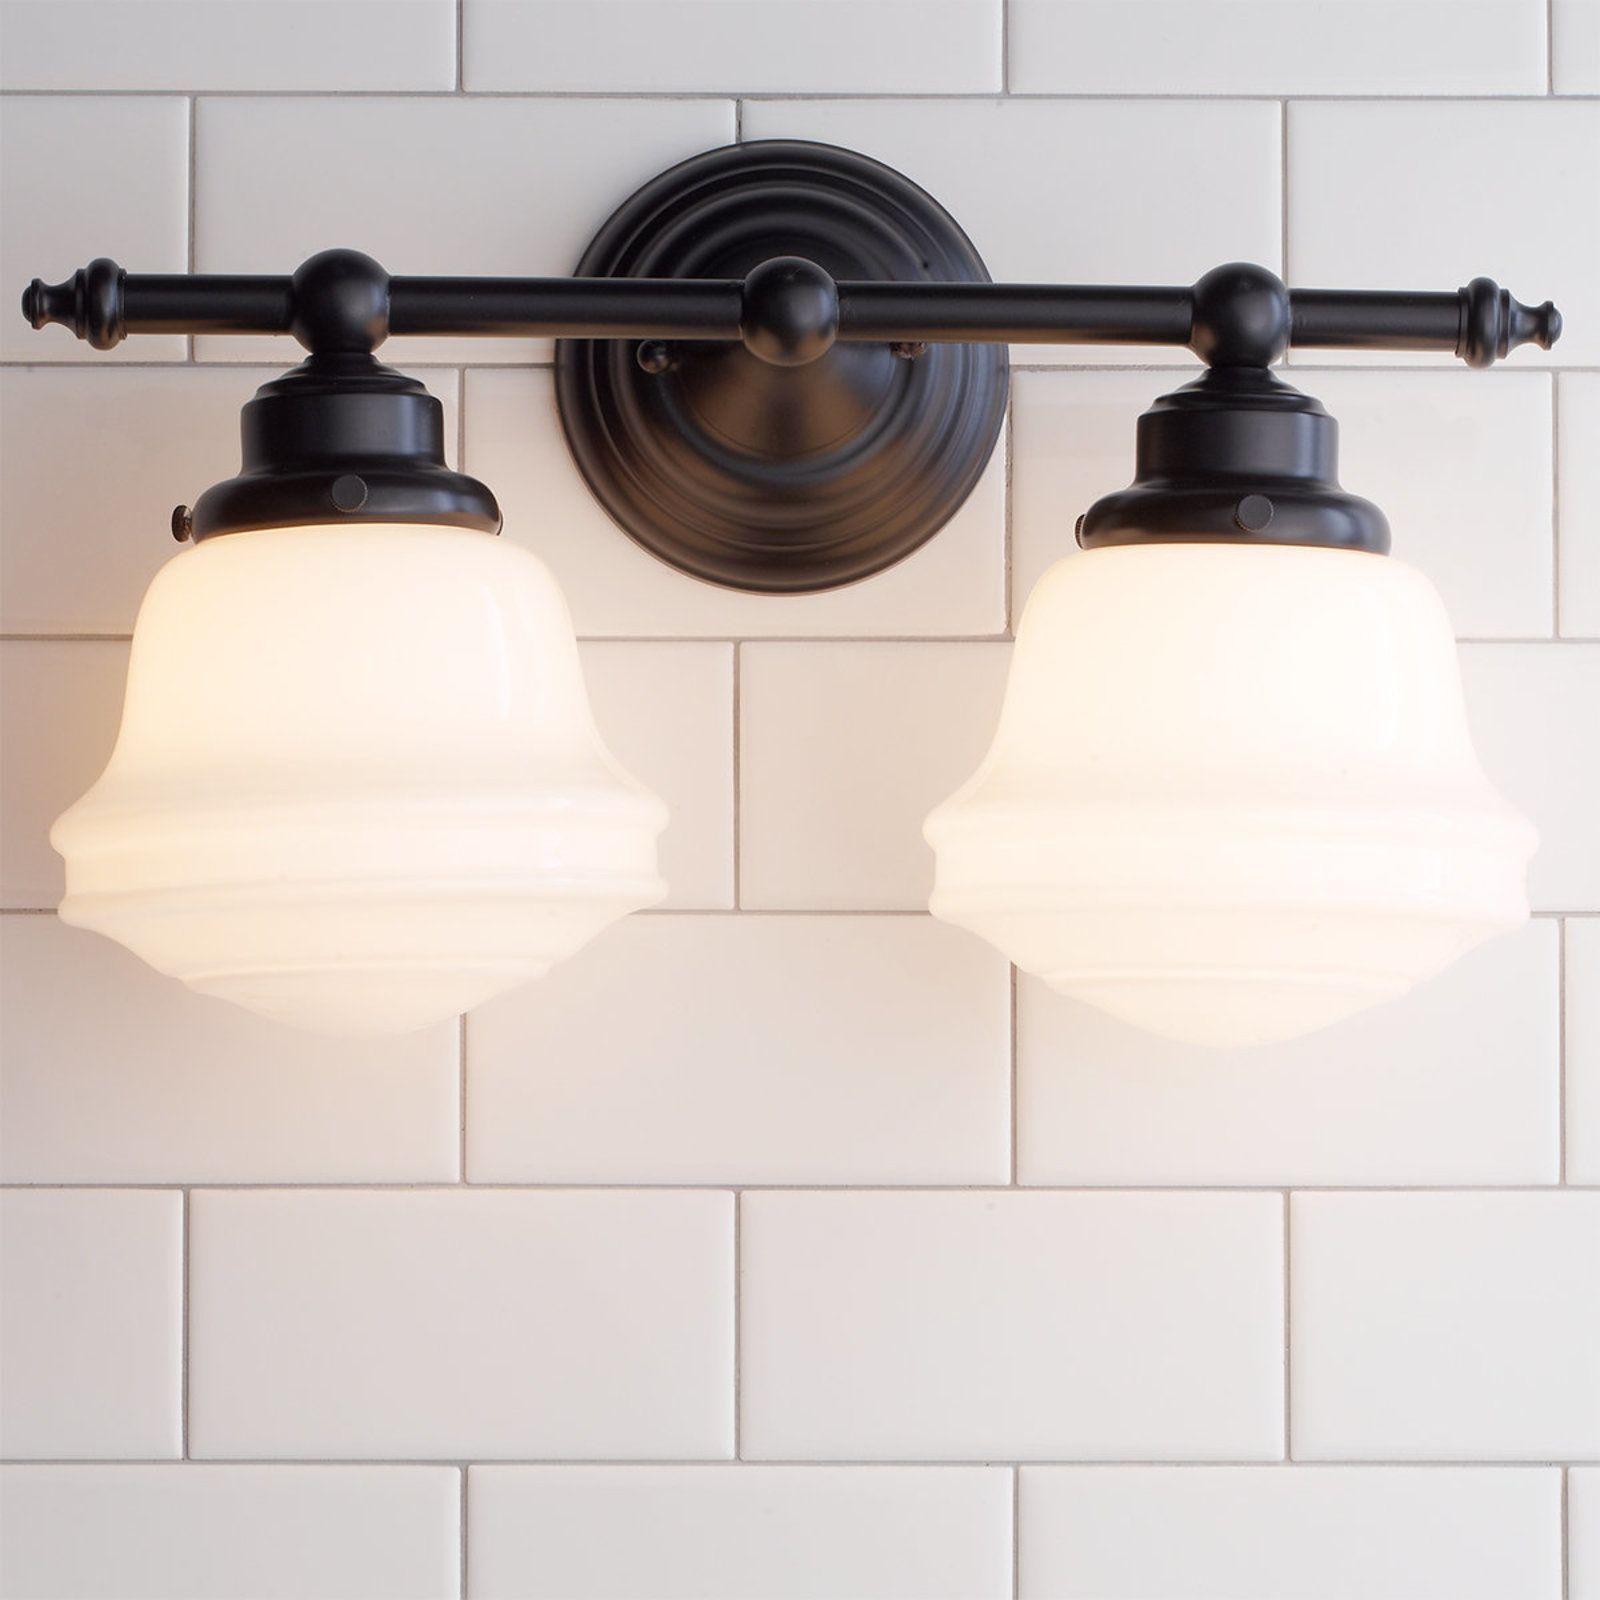 light room bedroom led costco bathroom ceiling paint menards bronze rubbed design lighting oil fixtures glittering spray feature lights track home